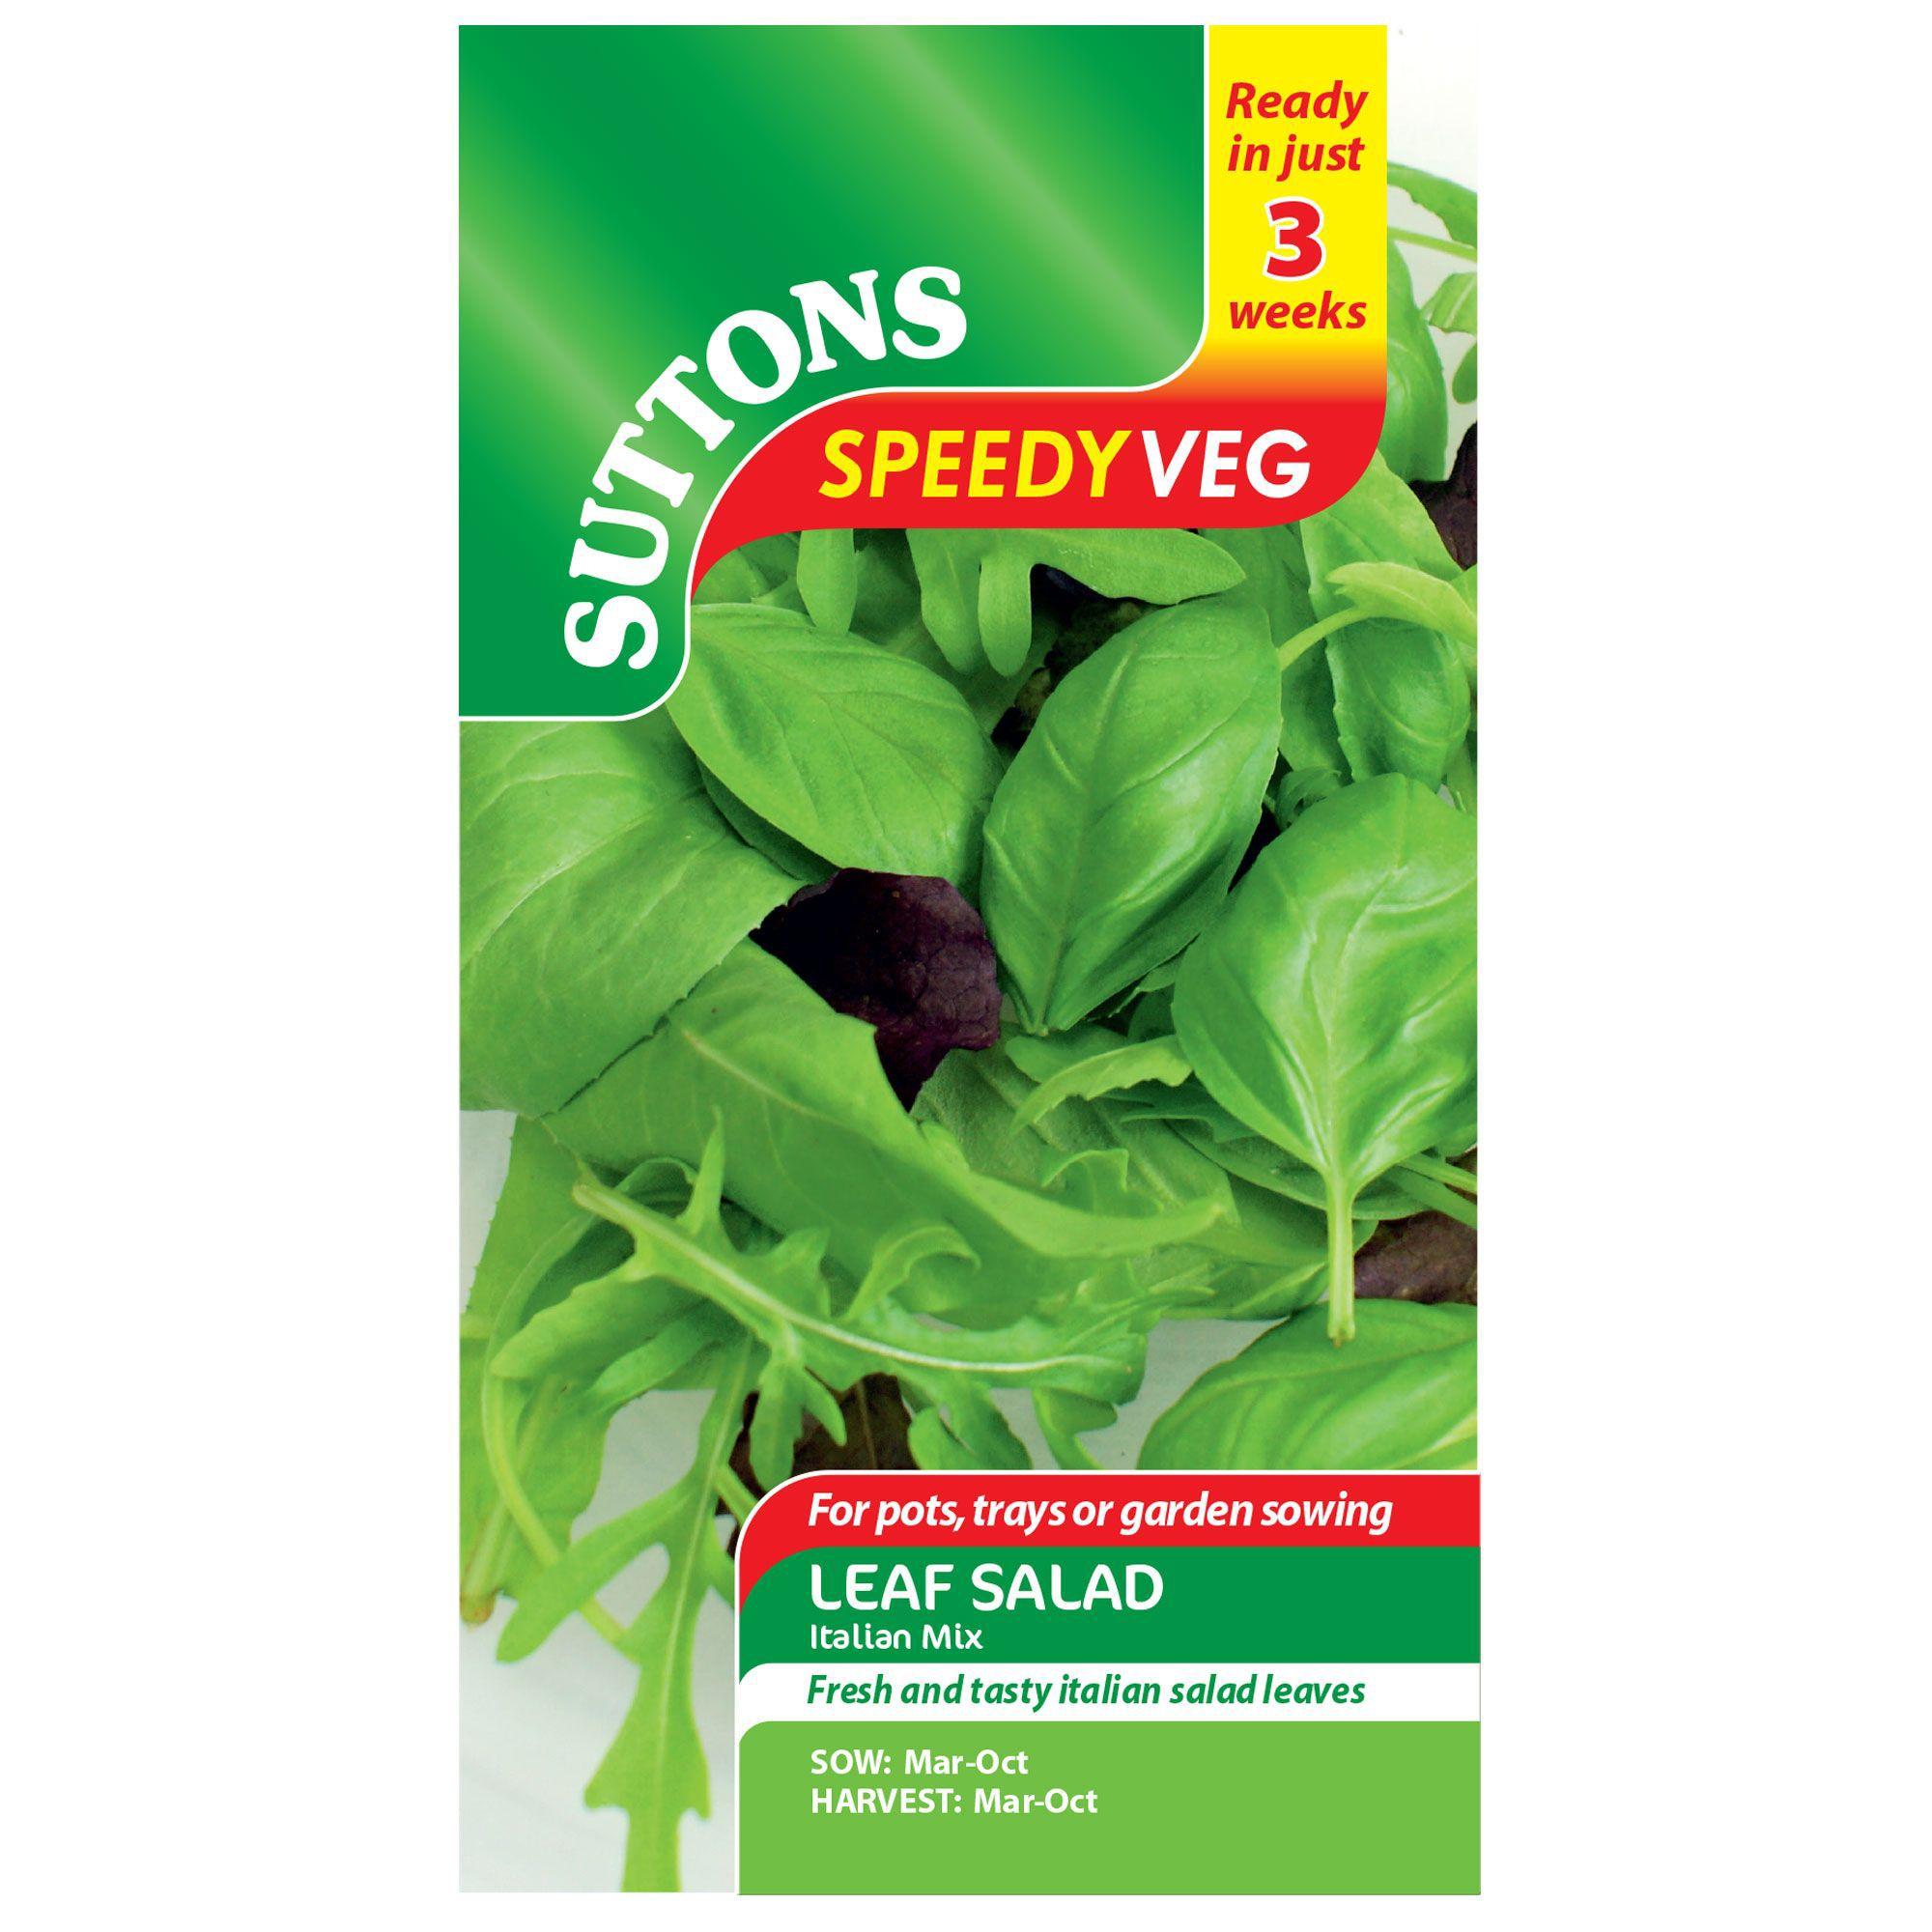 Suttons Speedy Veg Leaf Salad Seeds, Italian Mix